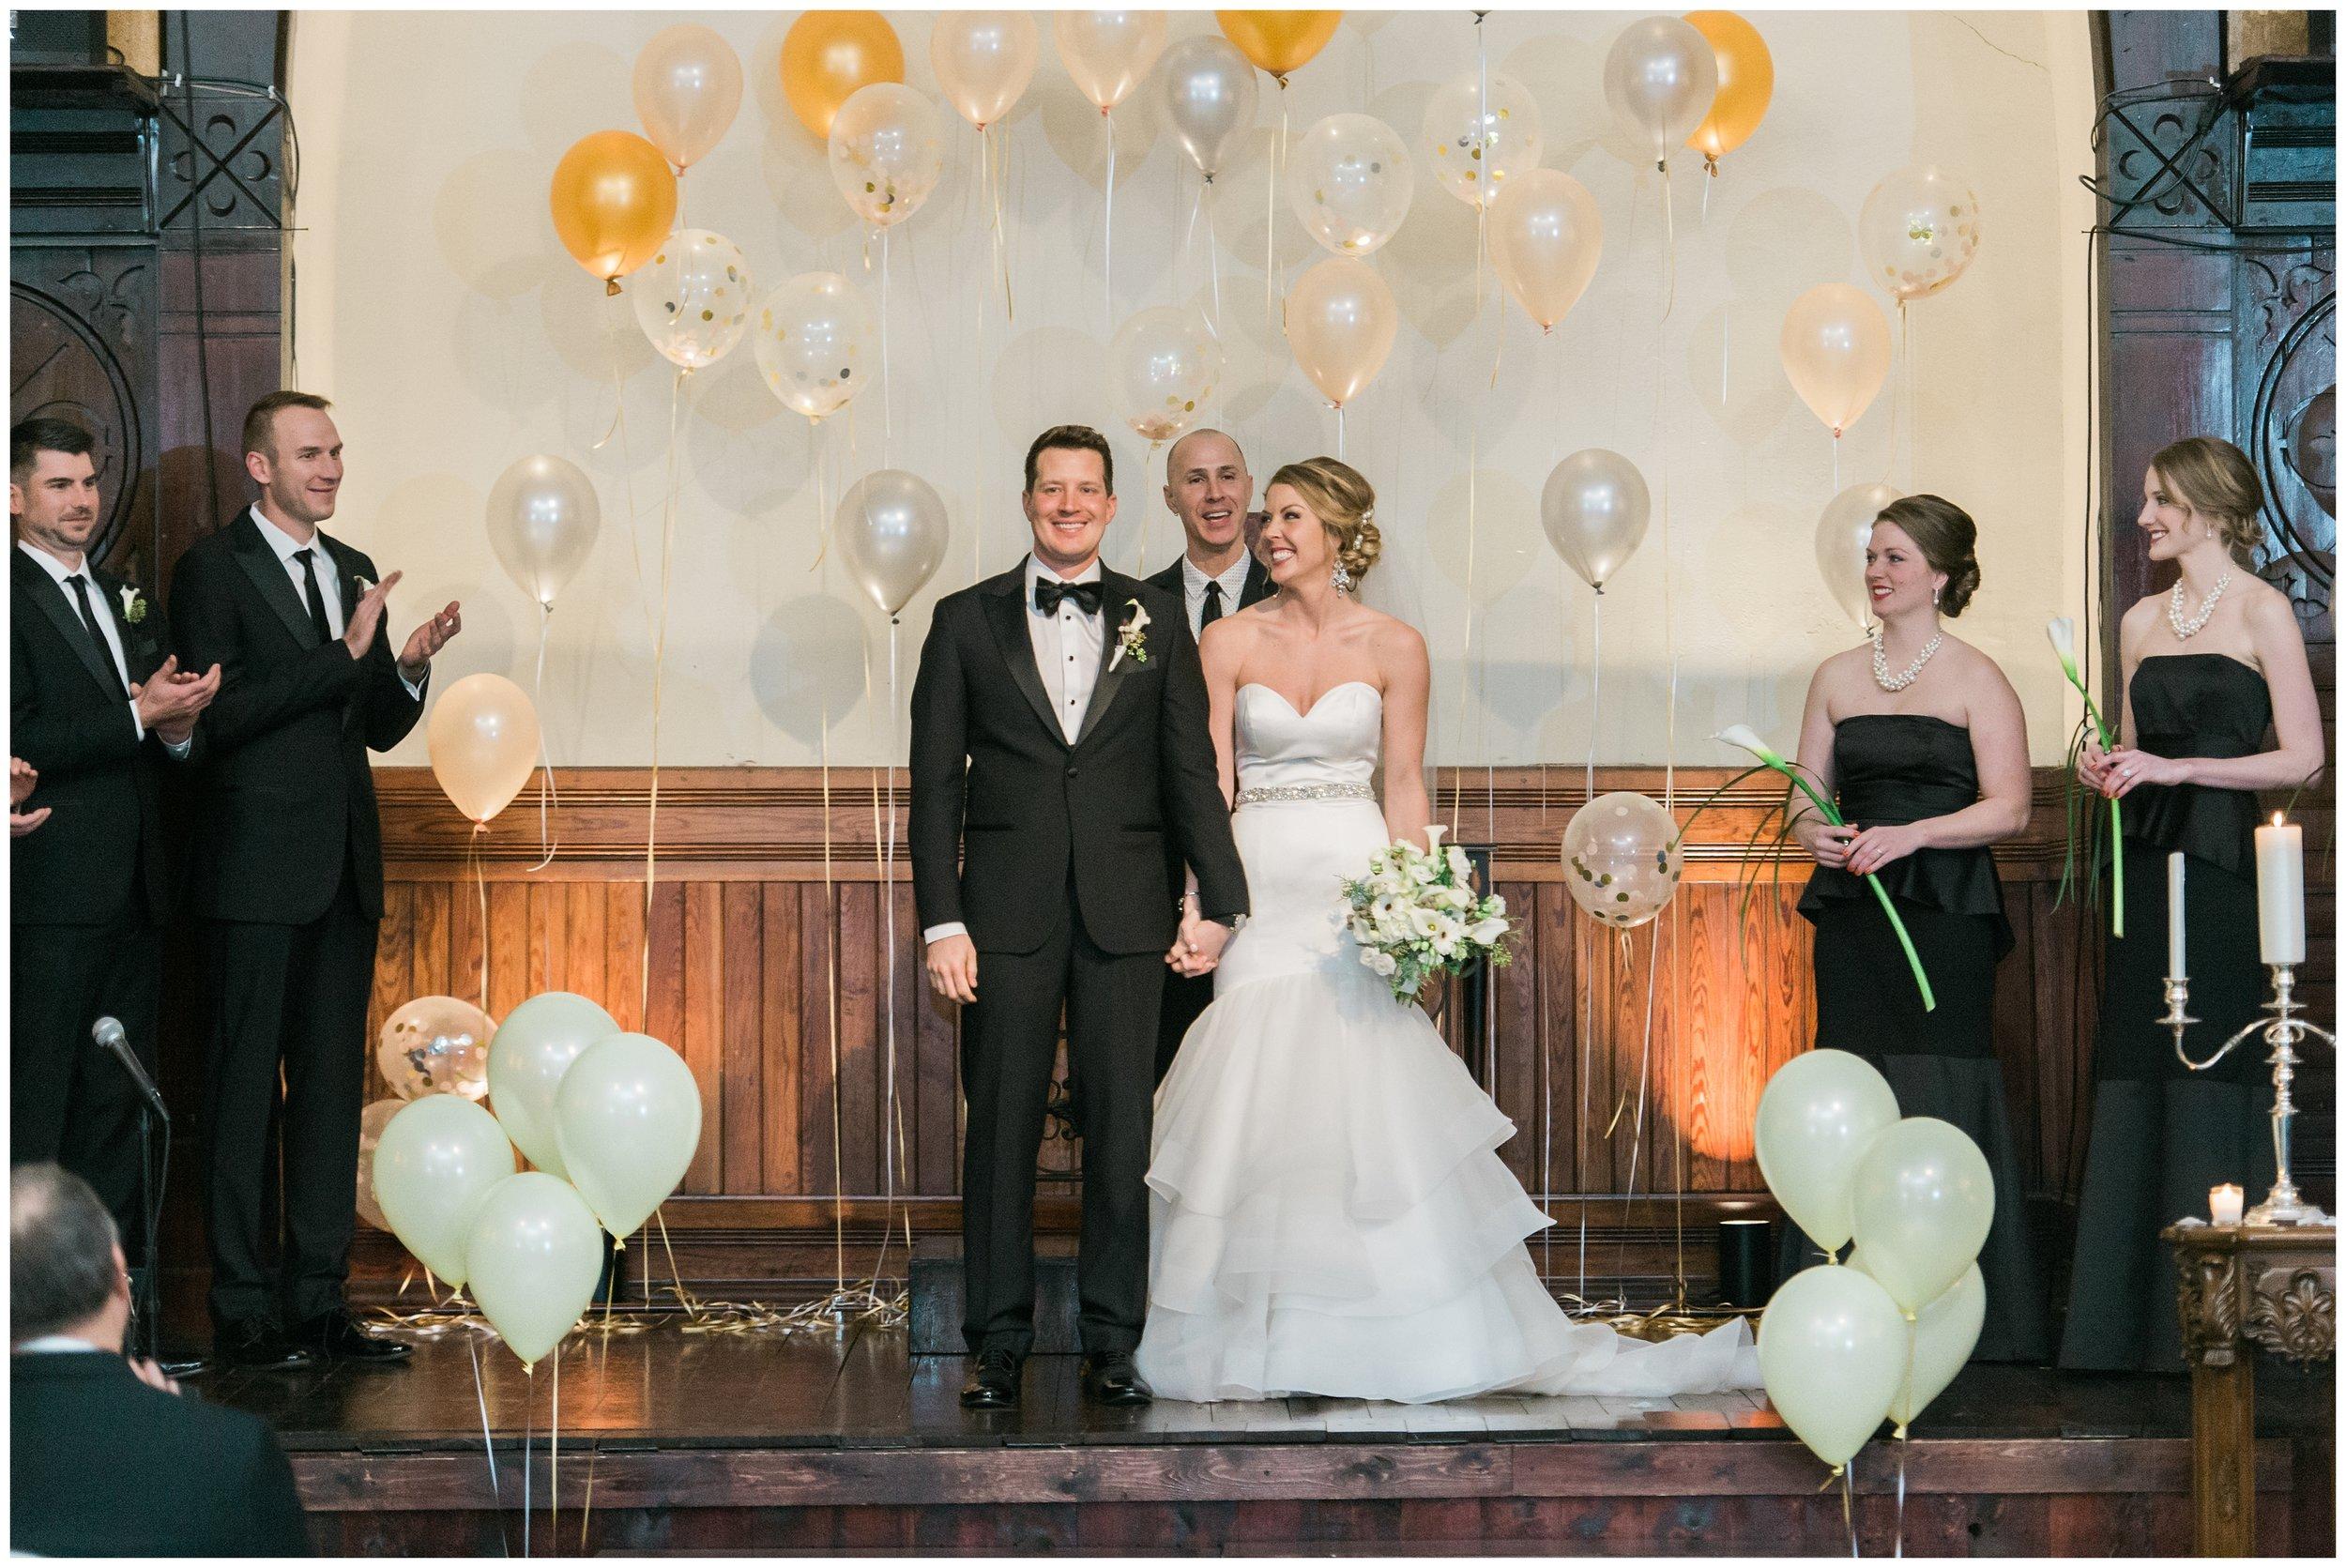 Rebecca_Bridges_Photography_Indianapolis_Wedding_Photographer_5835.jpg